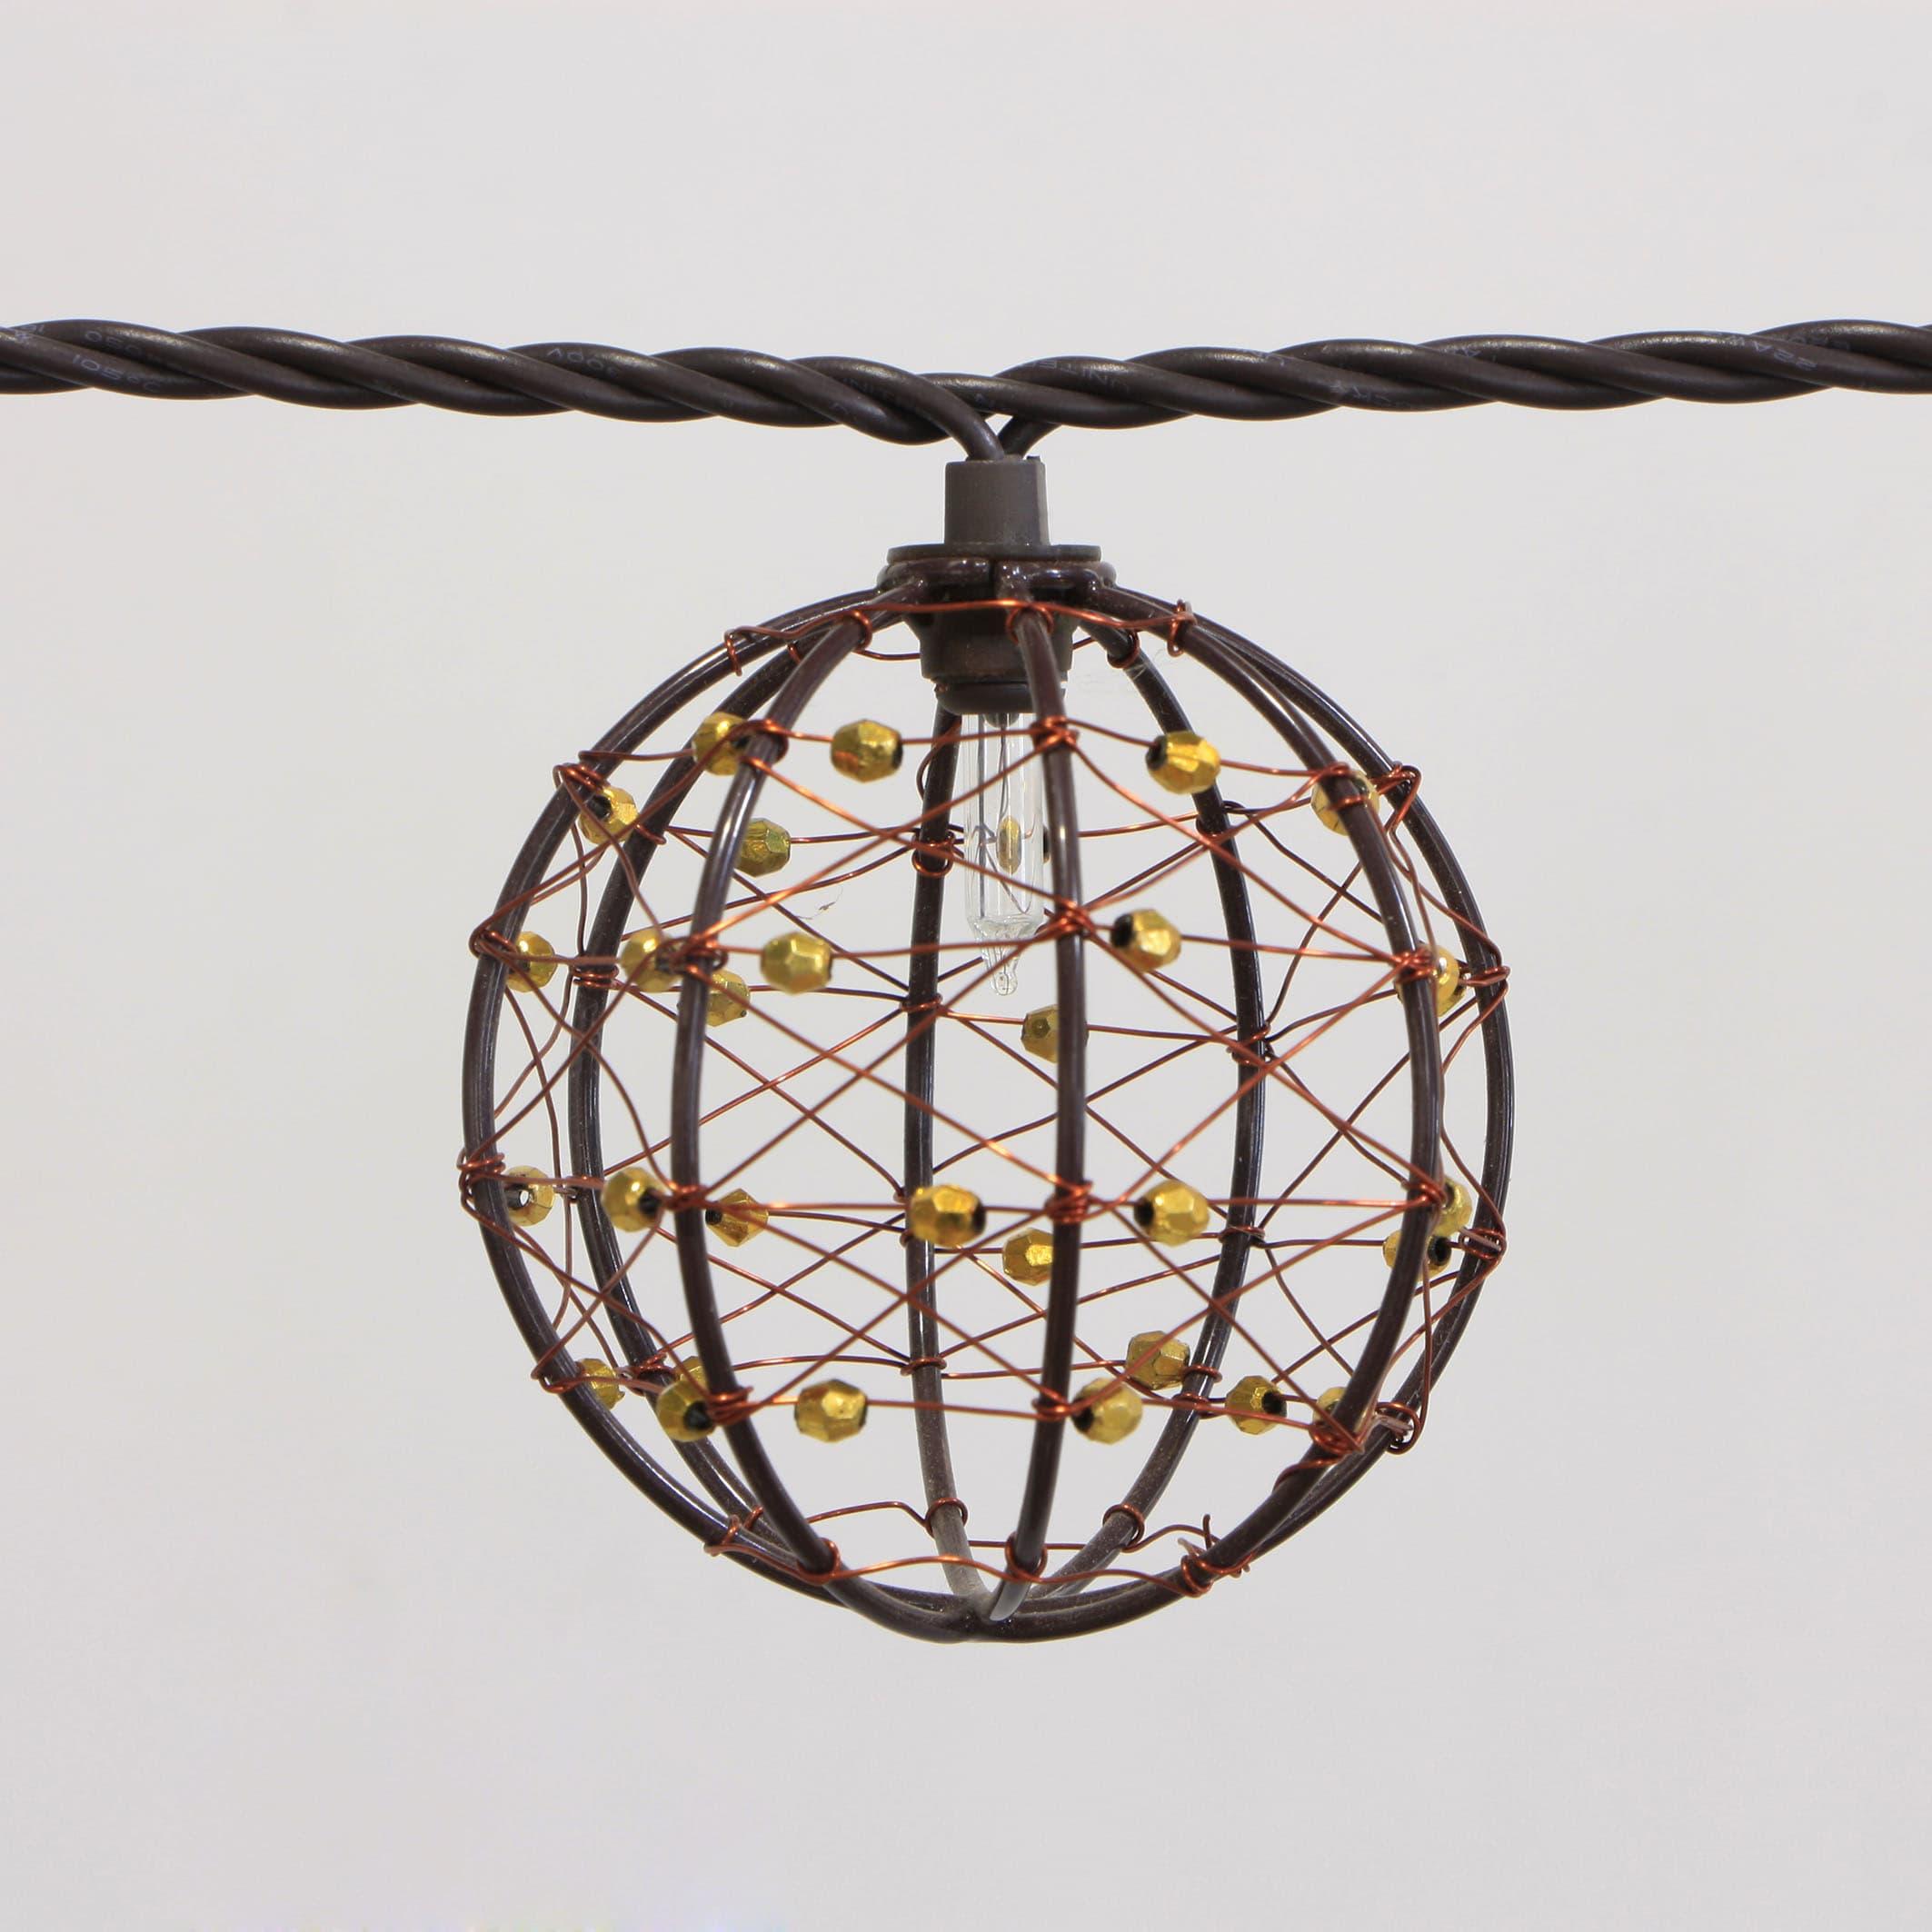 Decorative Beaded Copper Wire Ball String Light 10ct Kf01043 Tradekorea